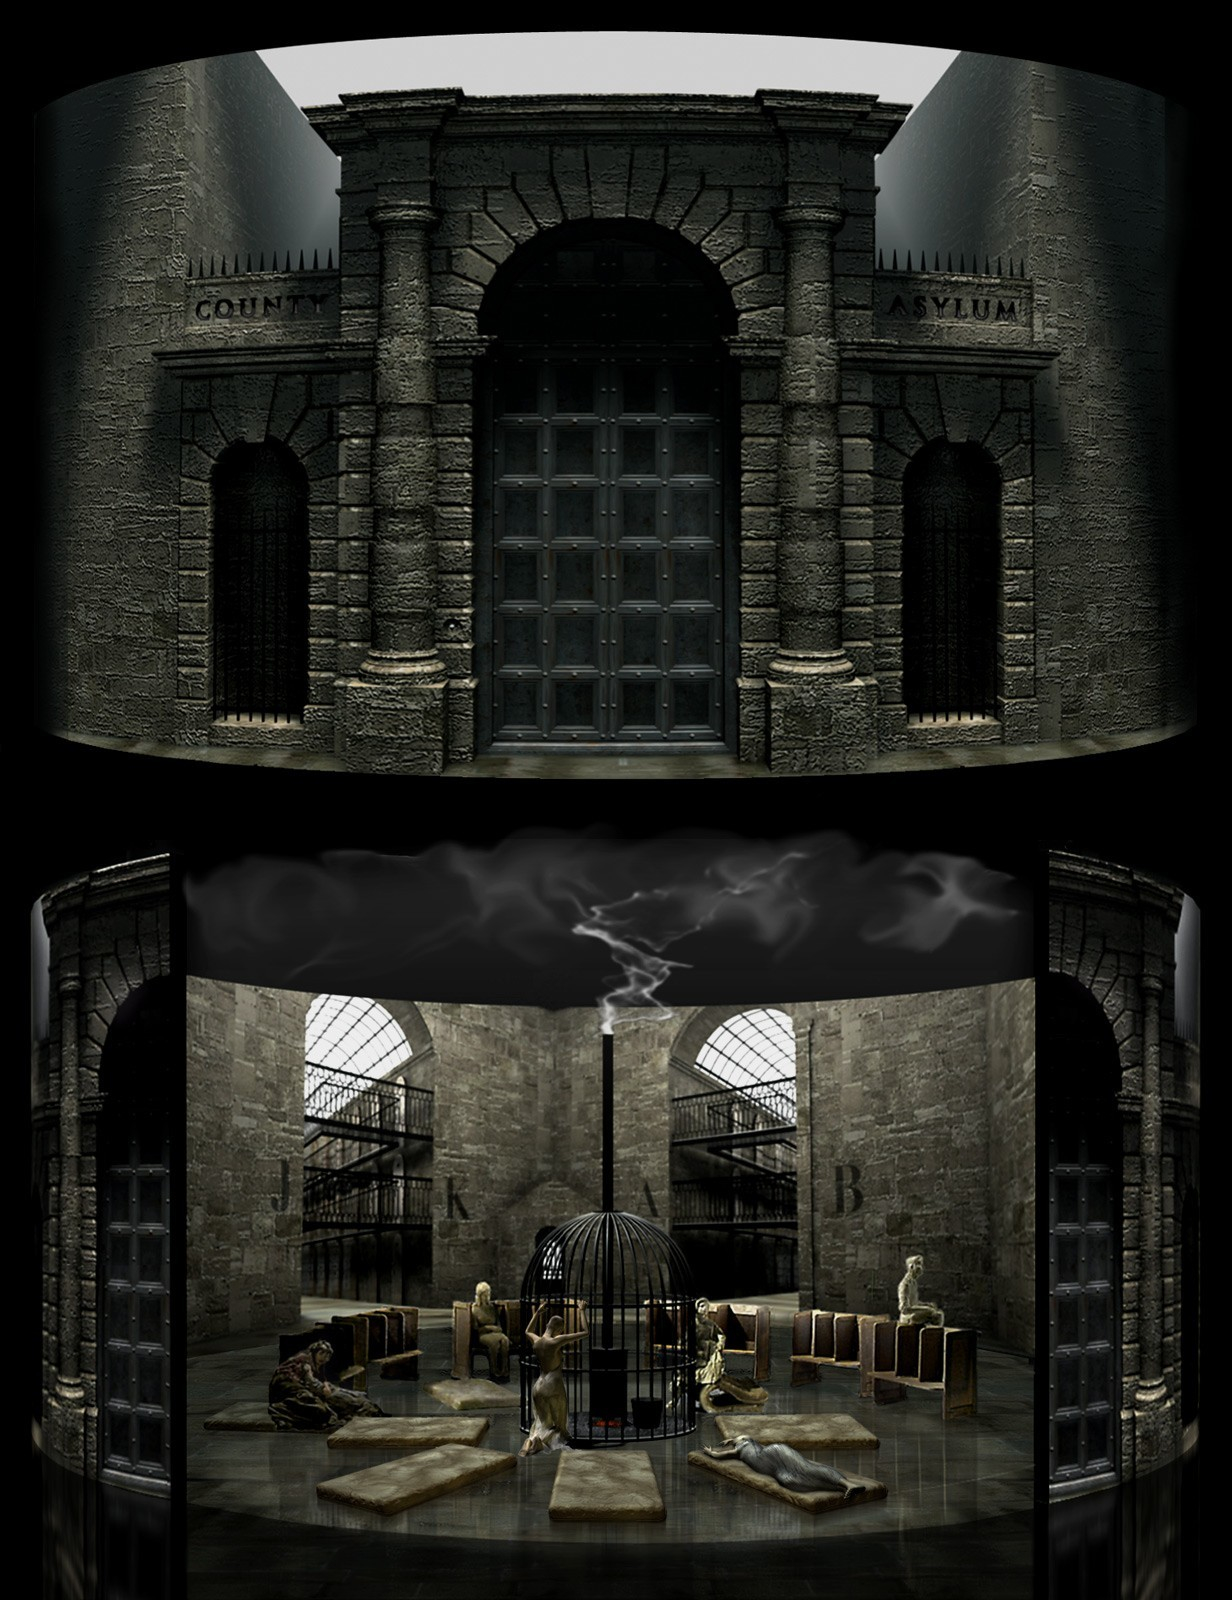 Bill d the lunatic asylum 1 34089407 ki0u